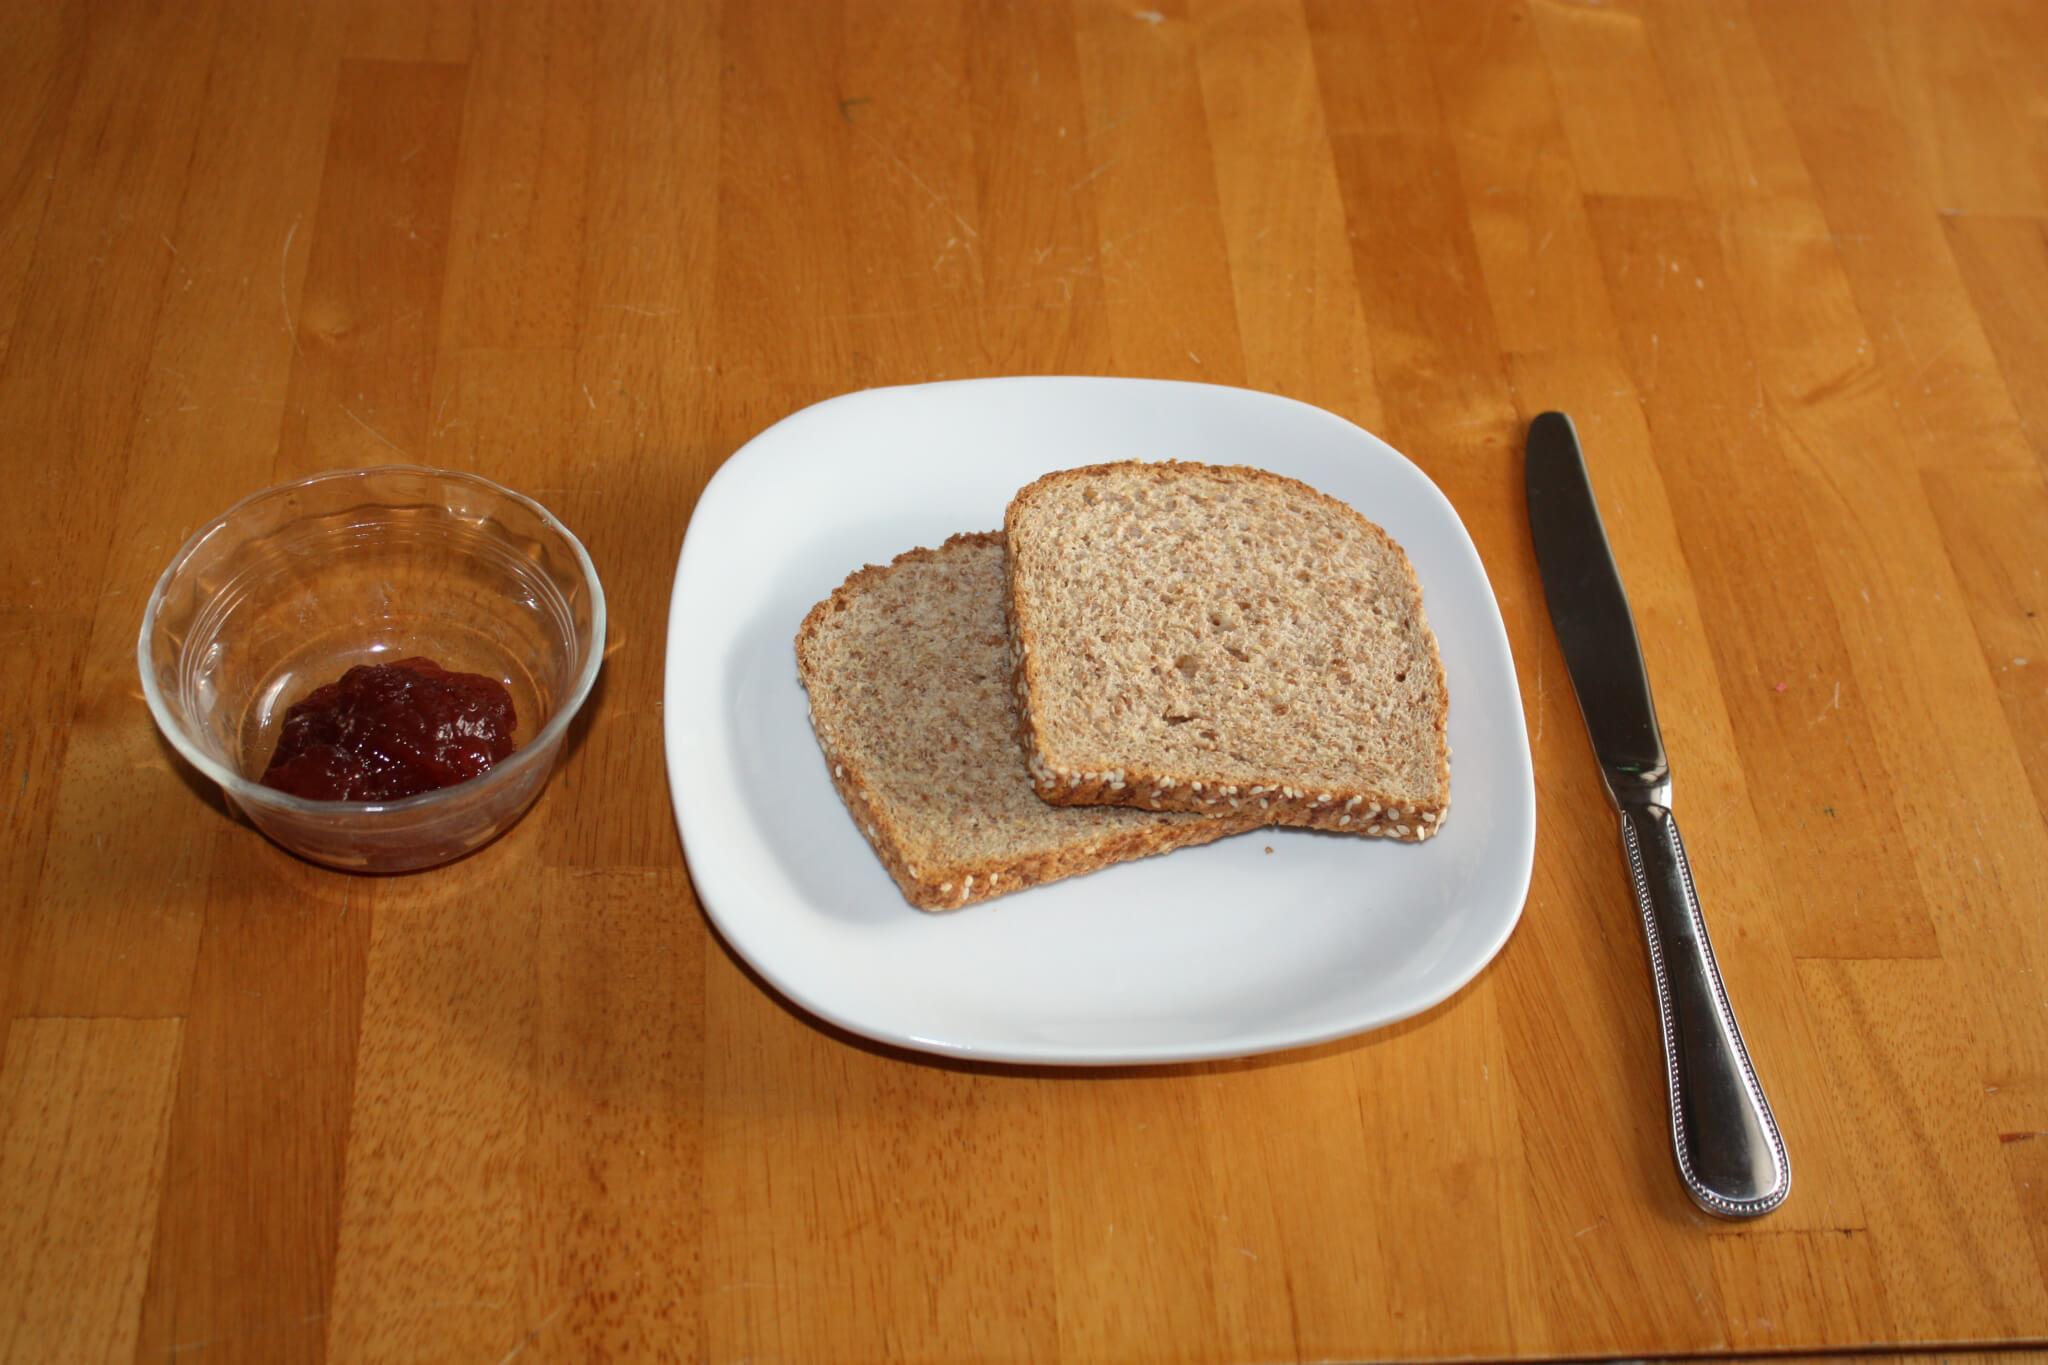 Practical Life Skills: Meal Time Prep